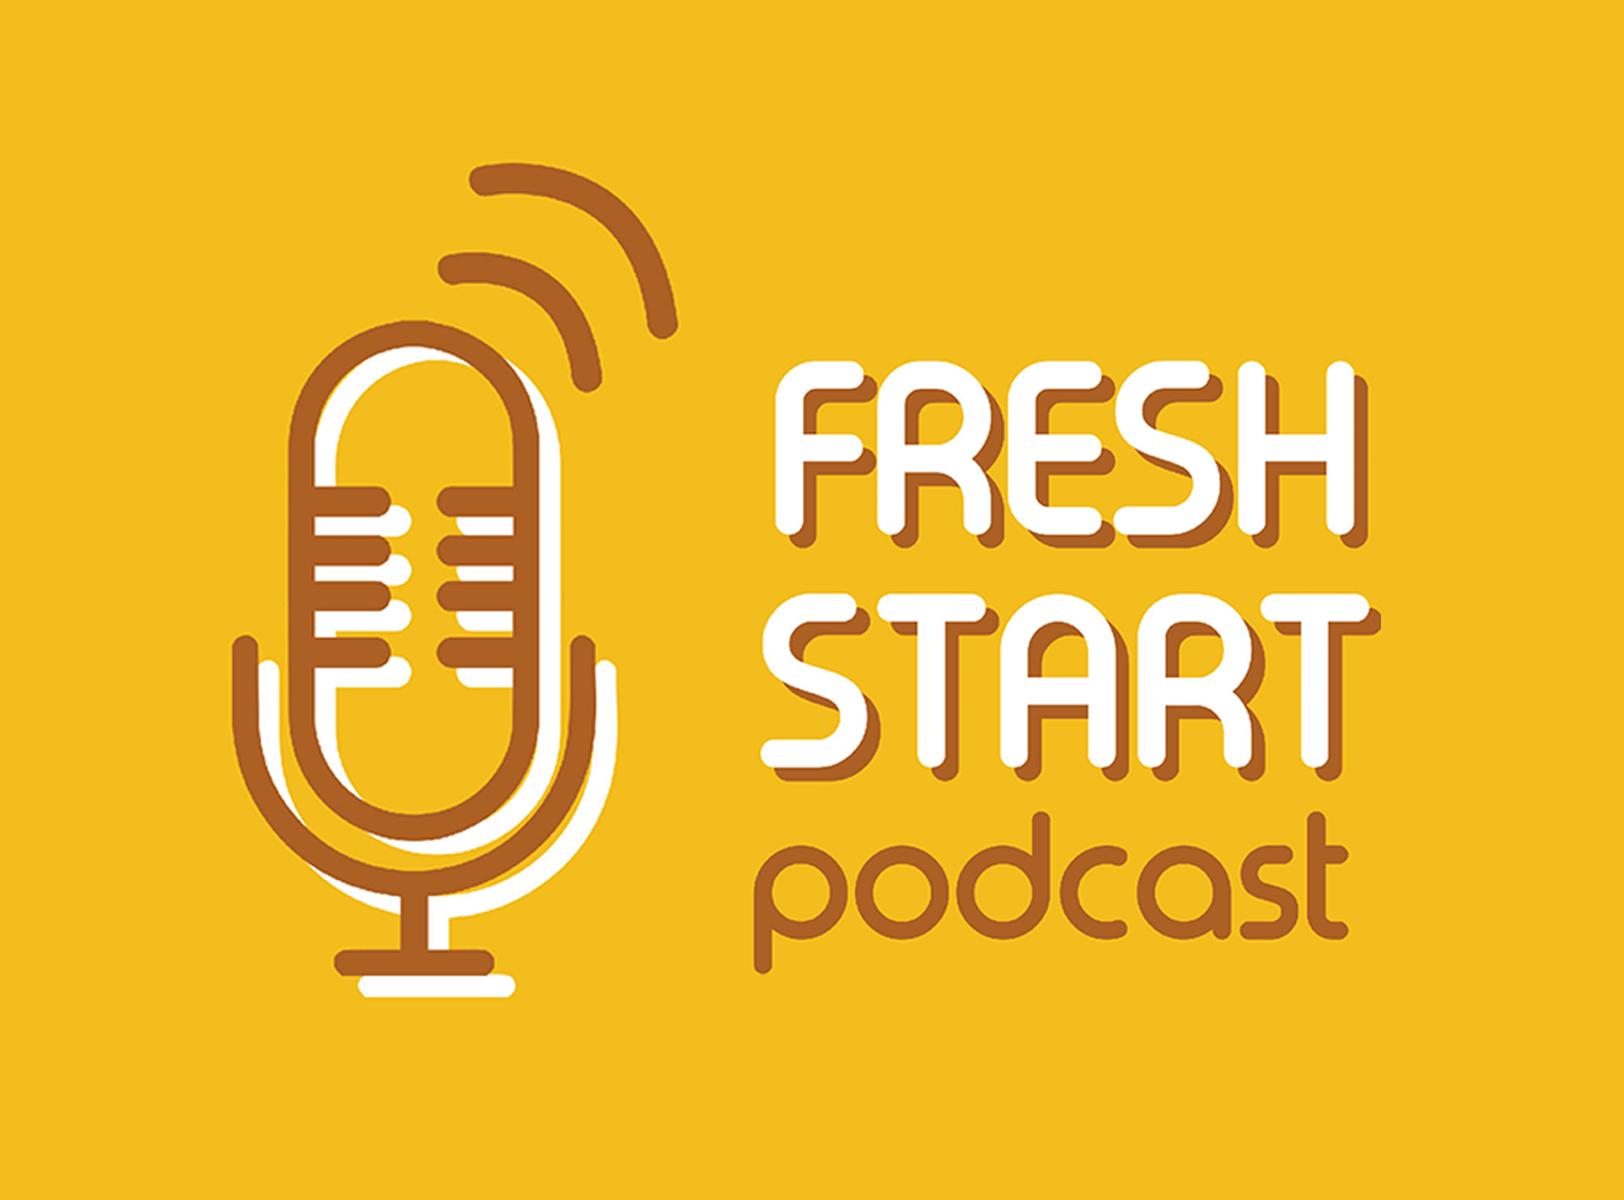 Fresh Start: Podcast News (11/10/2019 Mon.)